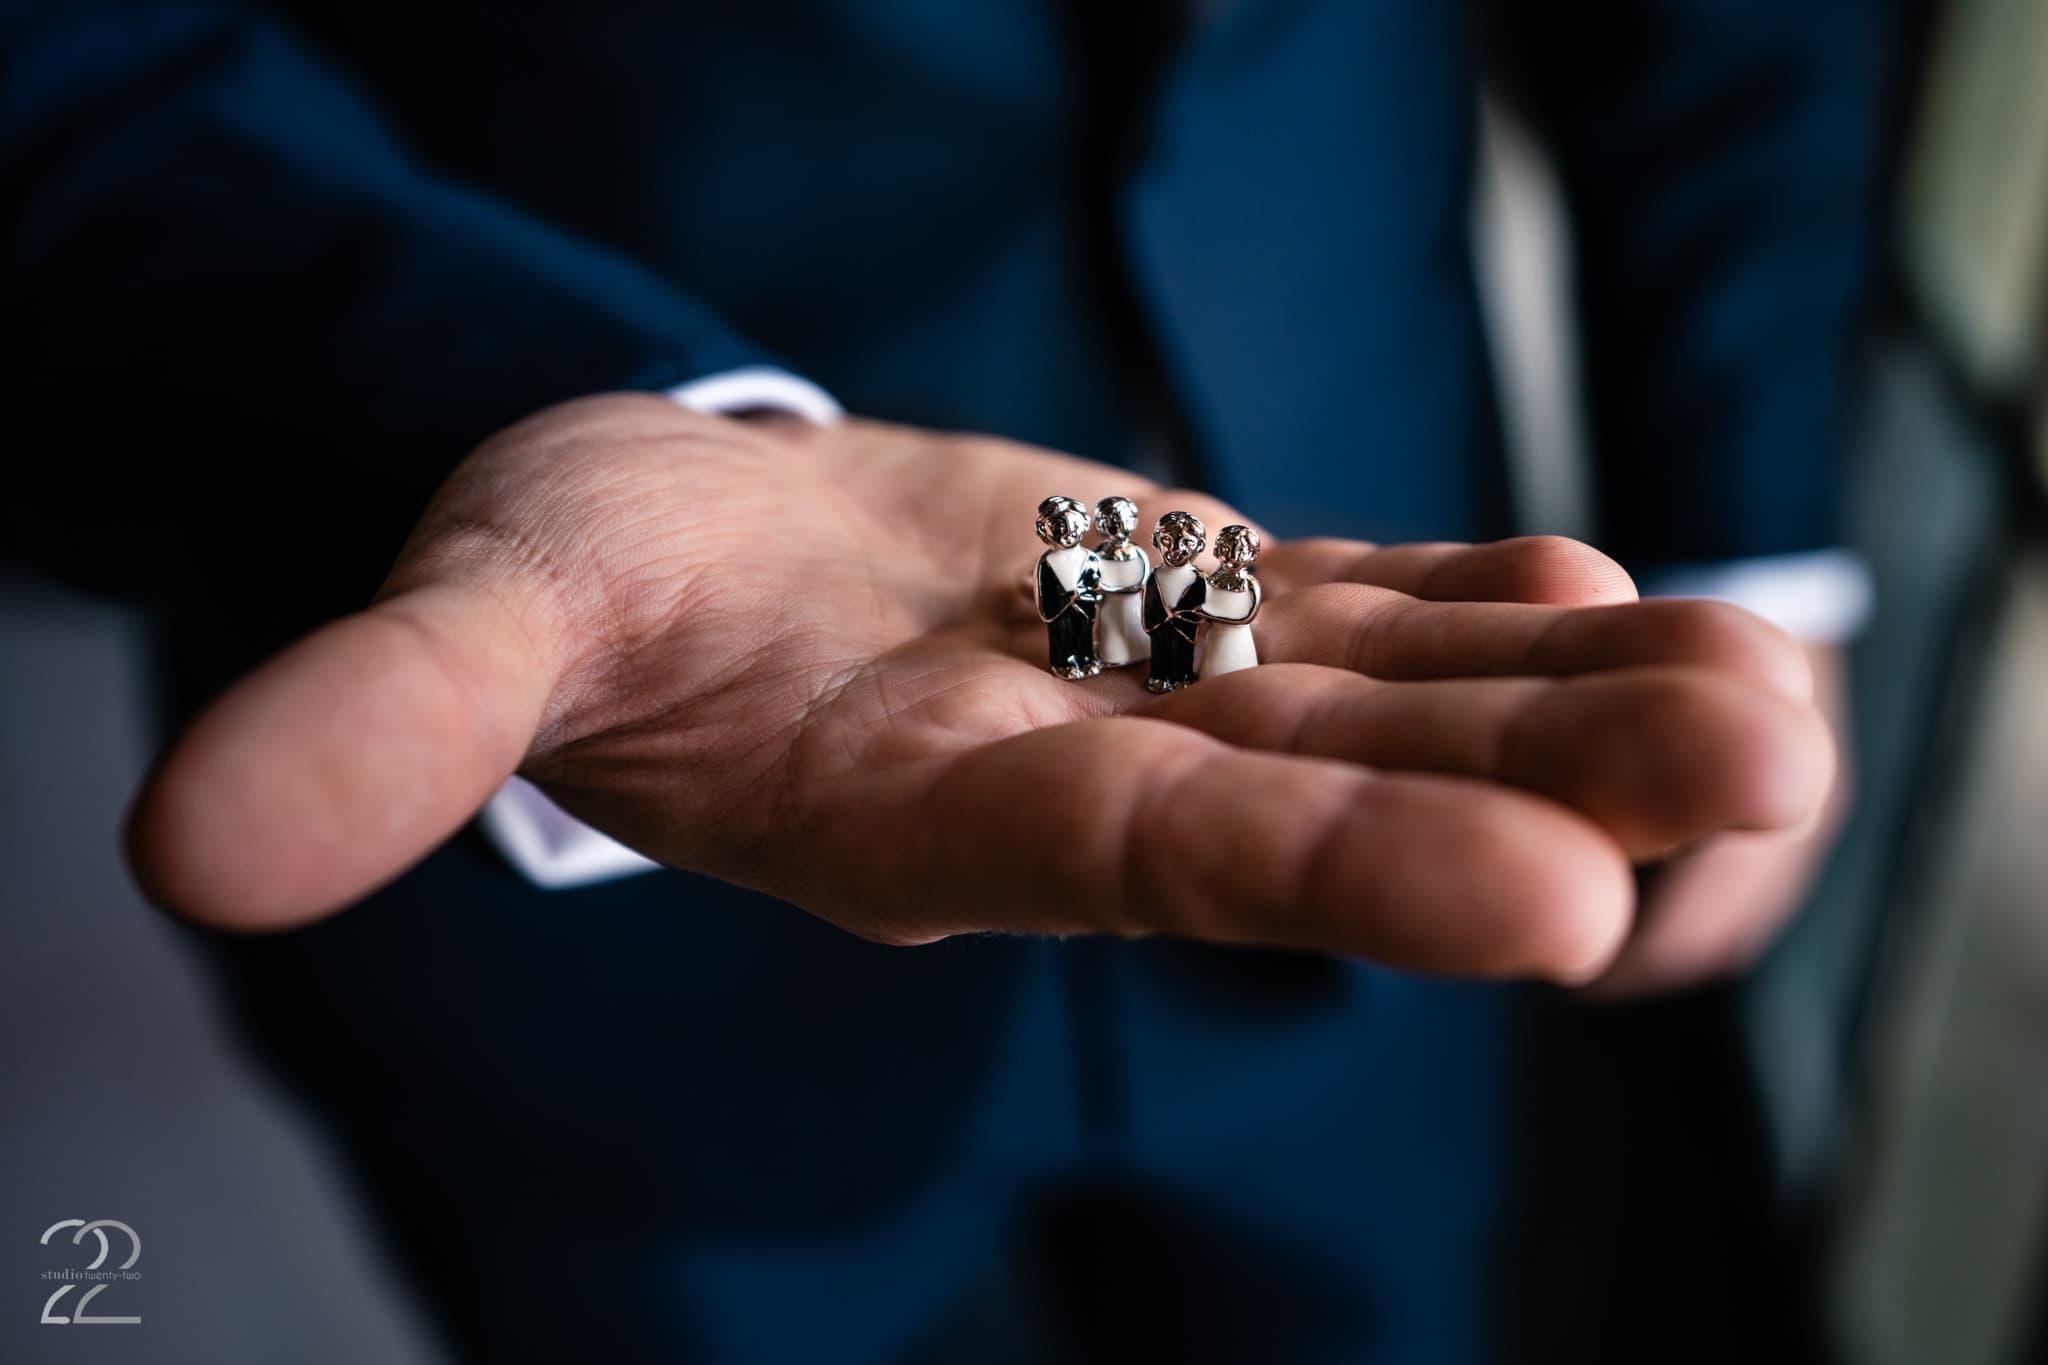 Groom Cufflinks for Wedding Day - Wedding Details